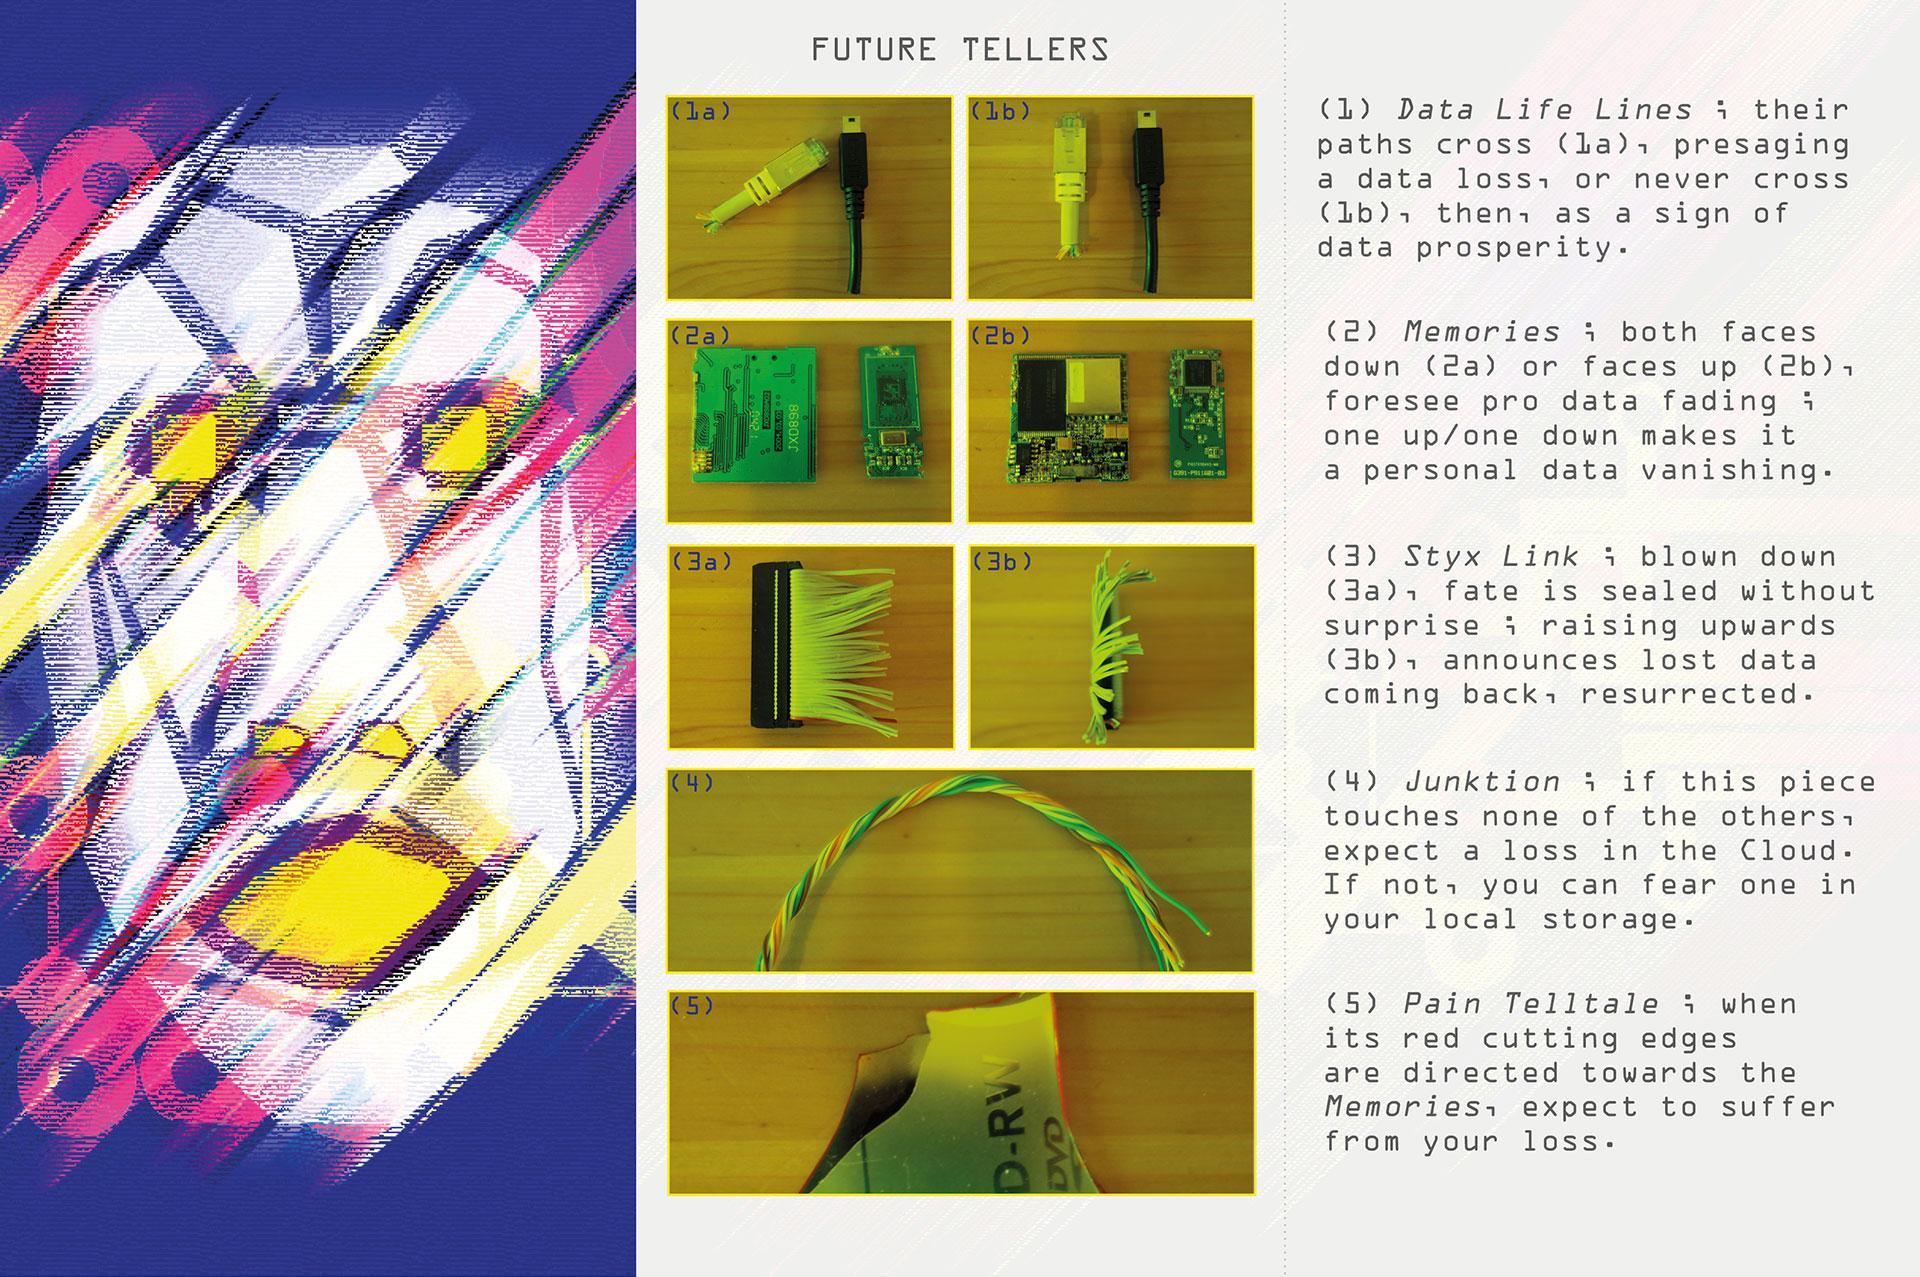 Maraboot kit: presentation of the future tellers